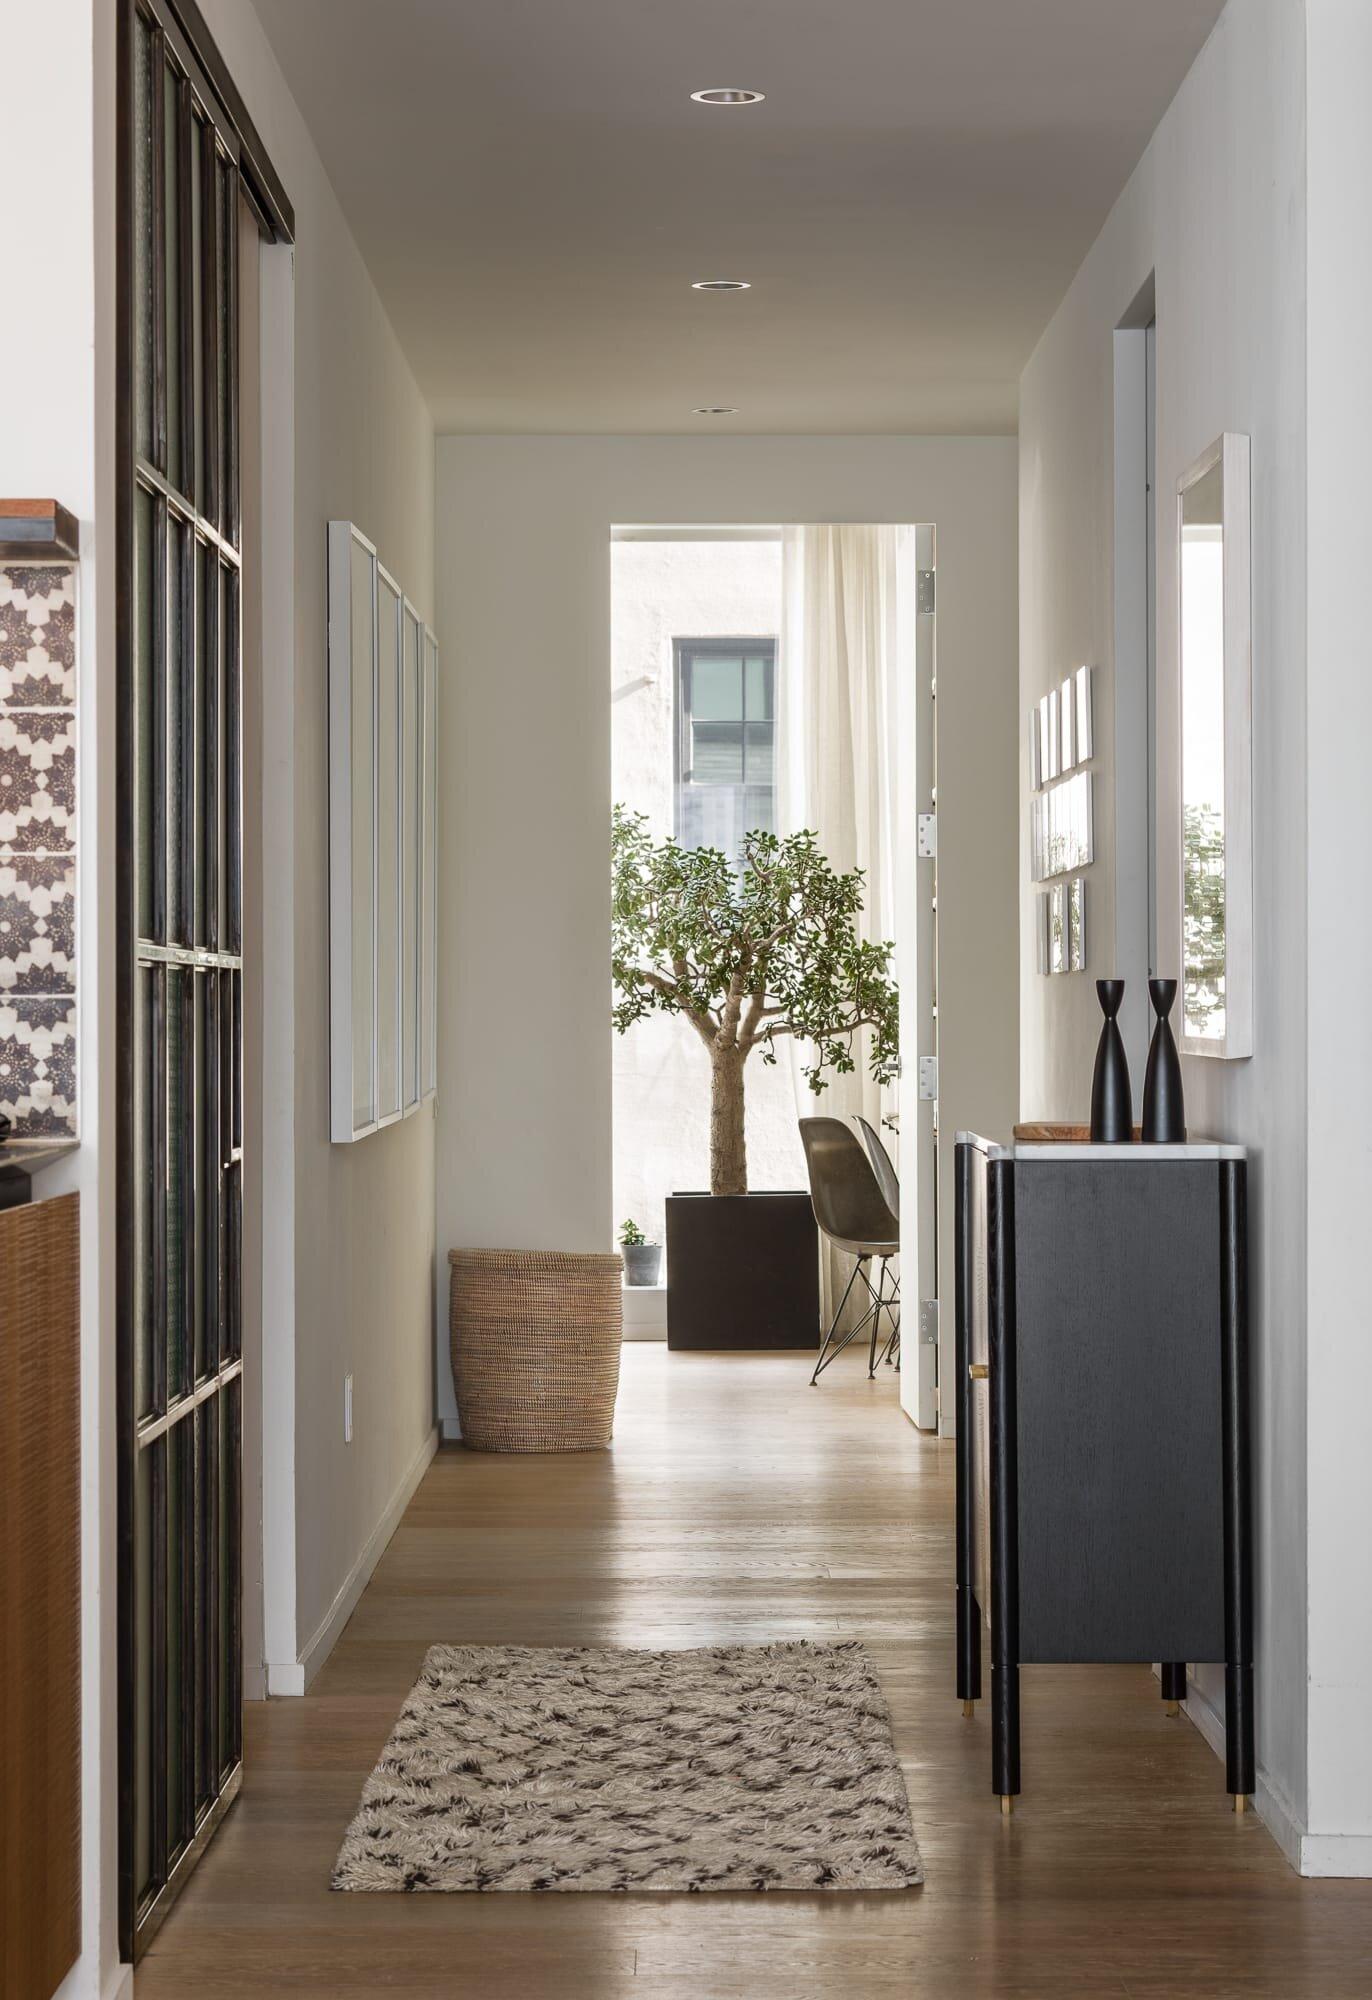 Hallway details by Alloy Development